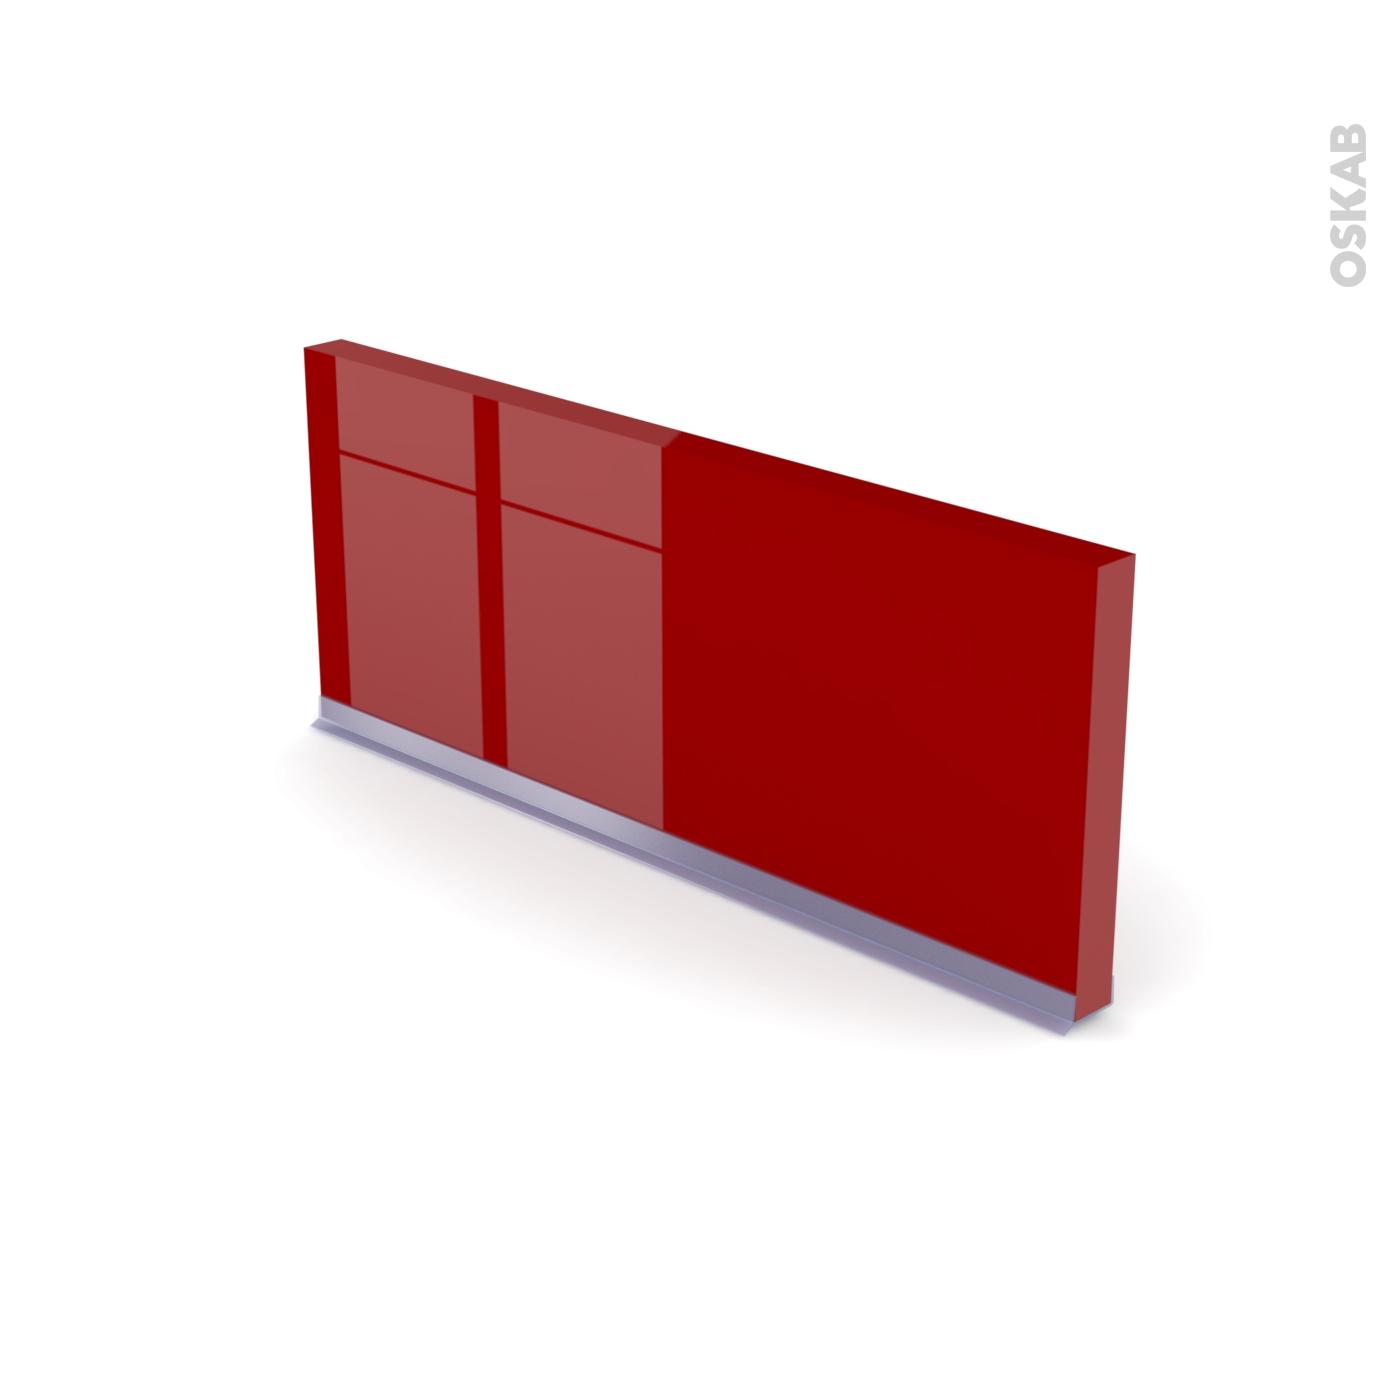 plinthe cuisine, pied de meuble - oskab - Plinthe Salle De Bain